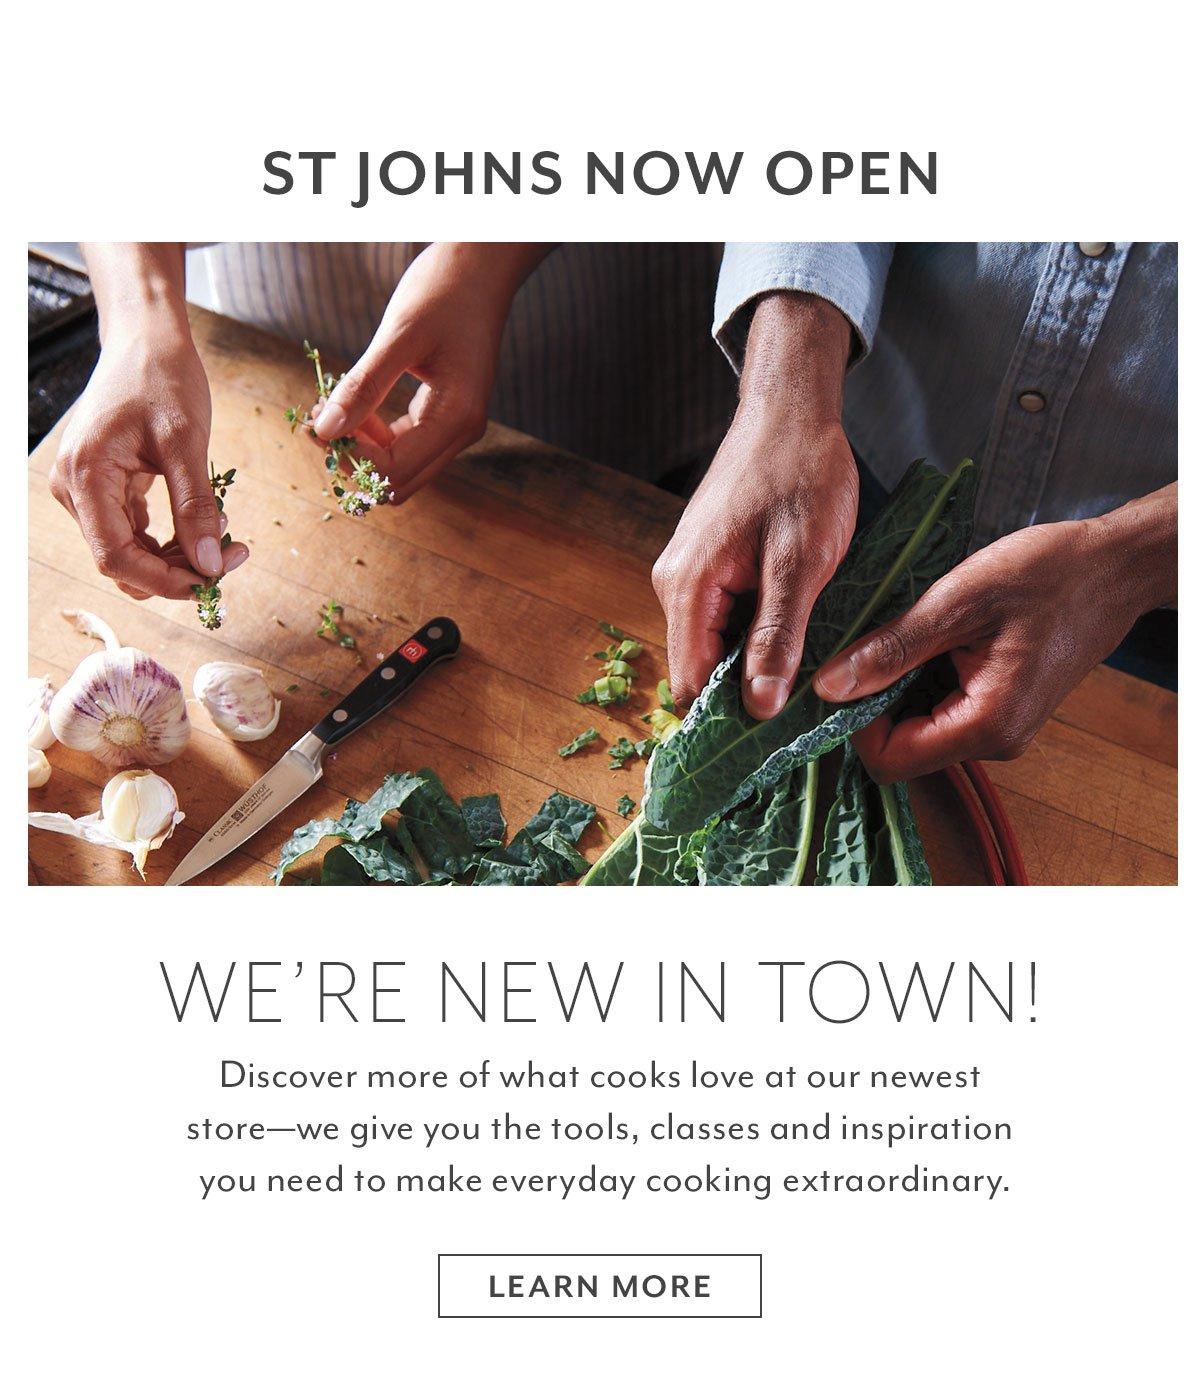 St. Johns Now Open